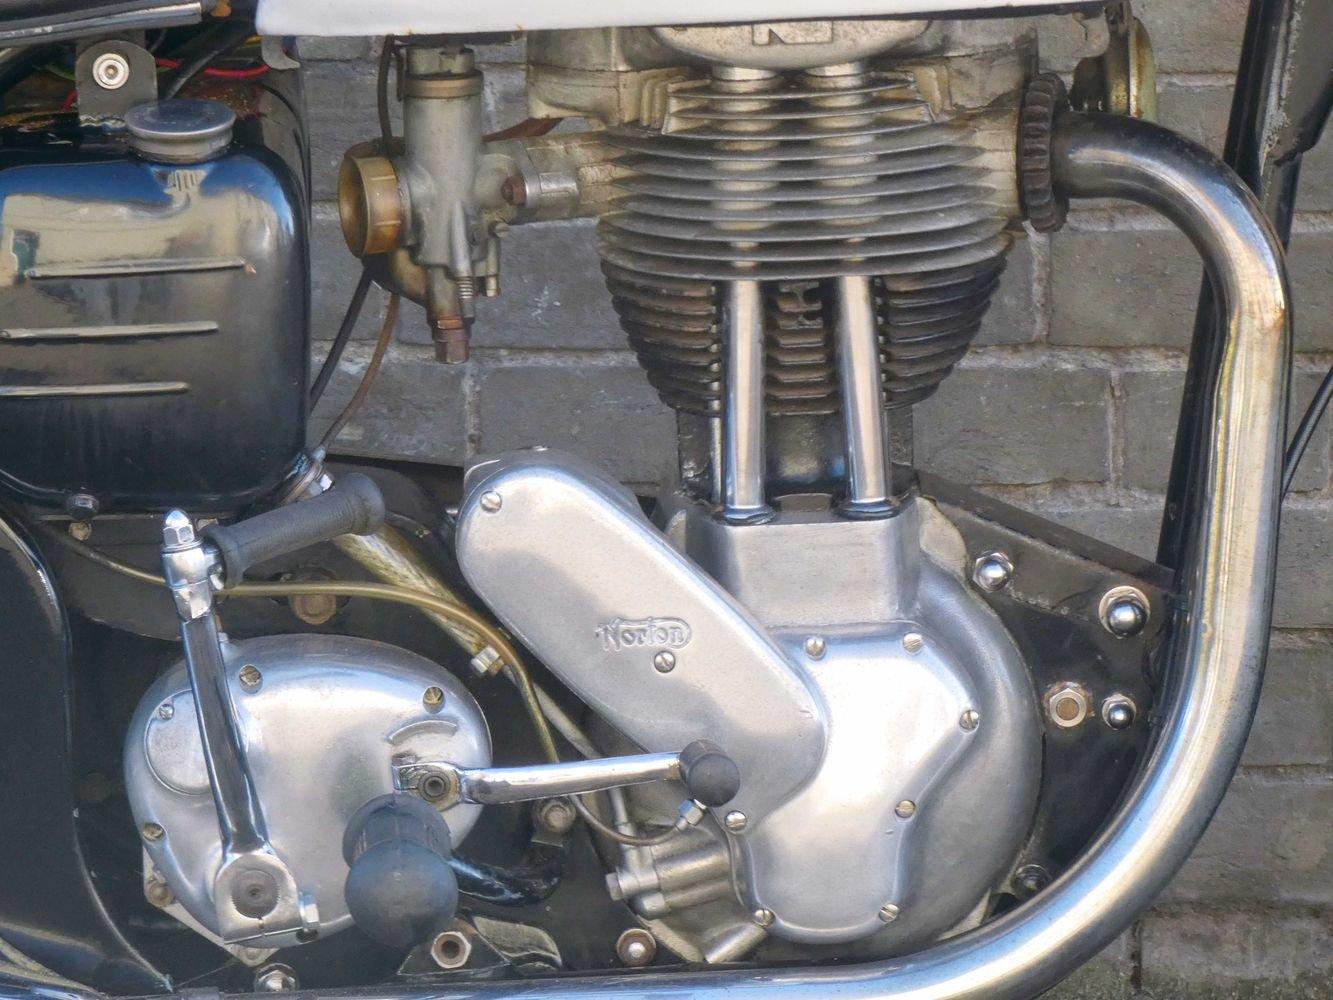 1960 Norton Model 50 350cc For Sale (picture 2 of 6)